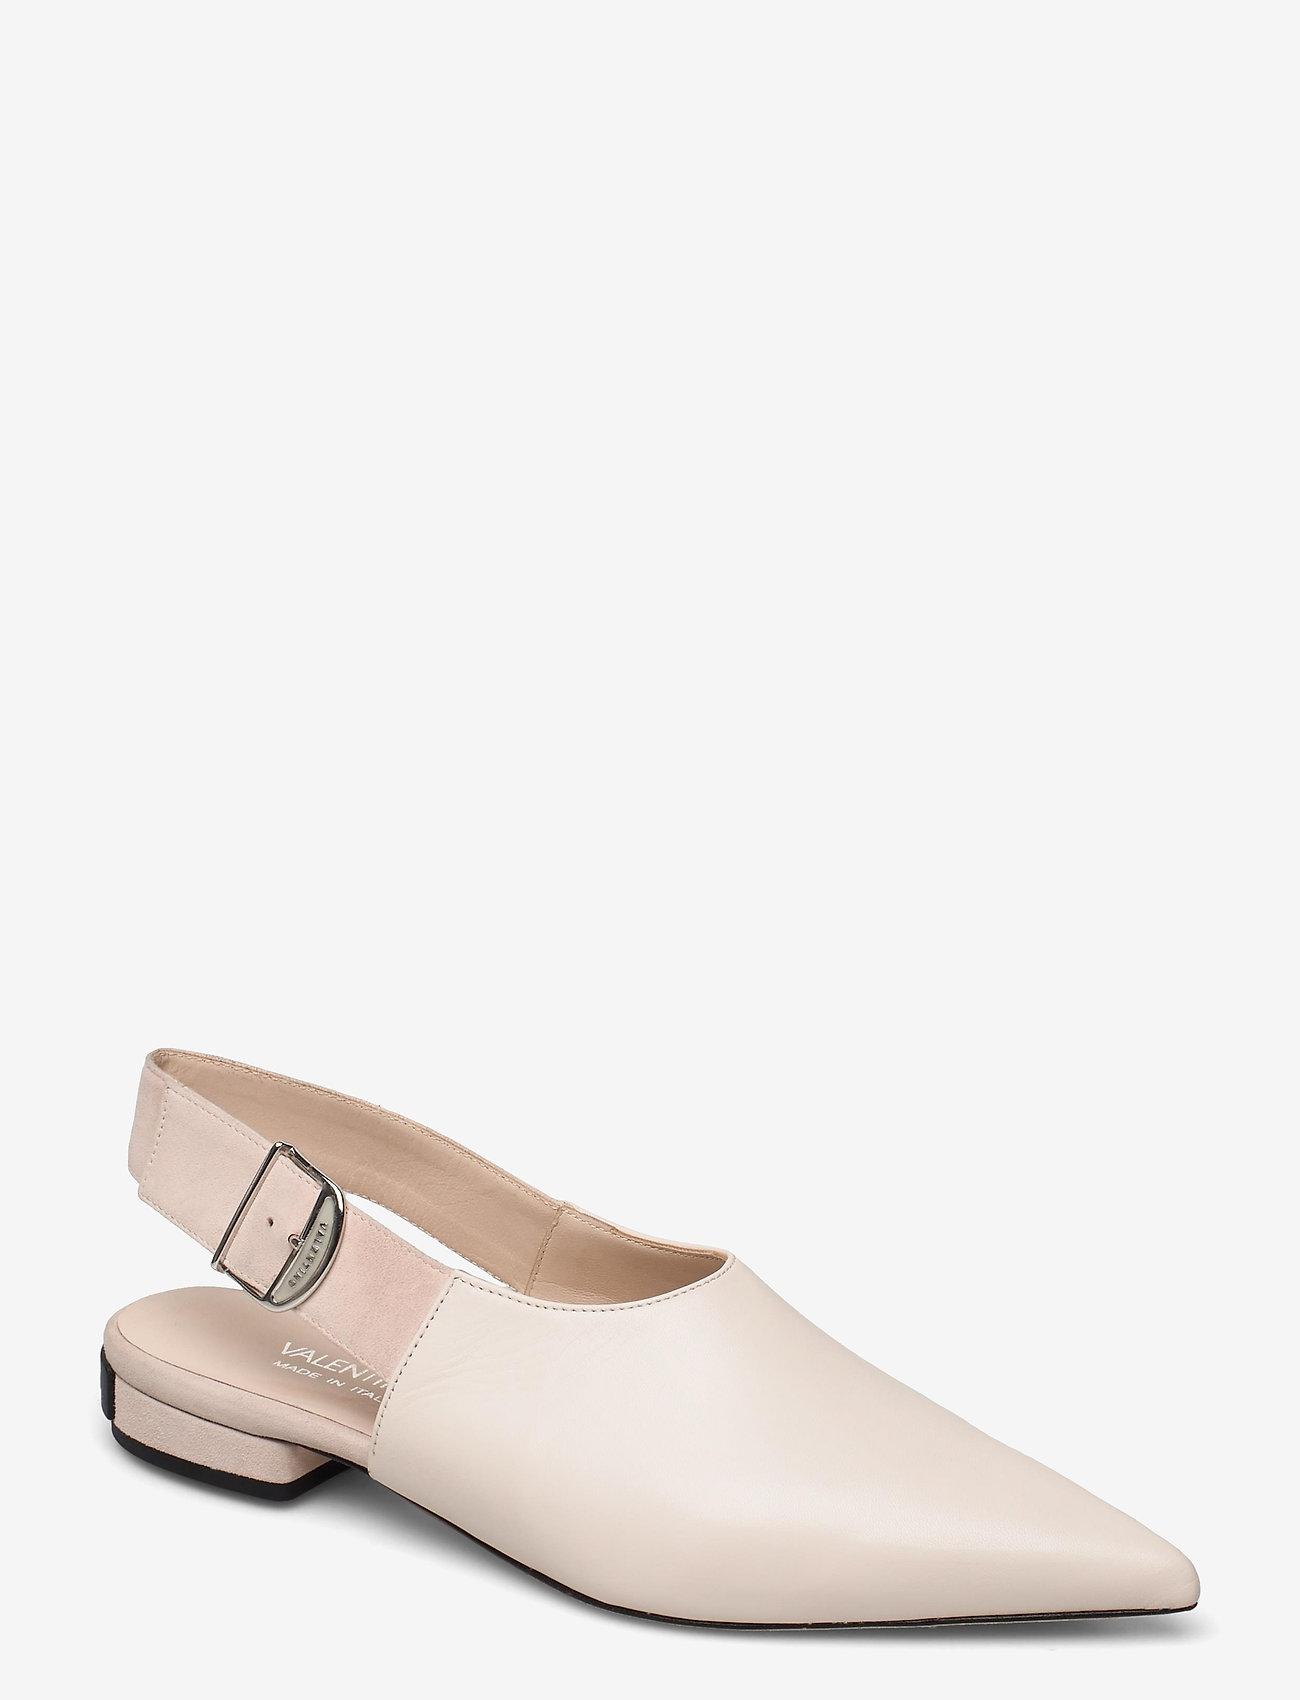 Valentino Shoes - SLINGBACK AND VALENTINO BUCKLE - ballerinas - white - 0